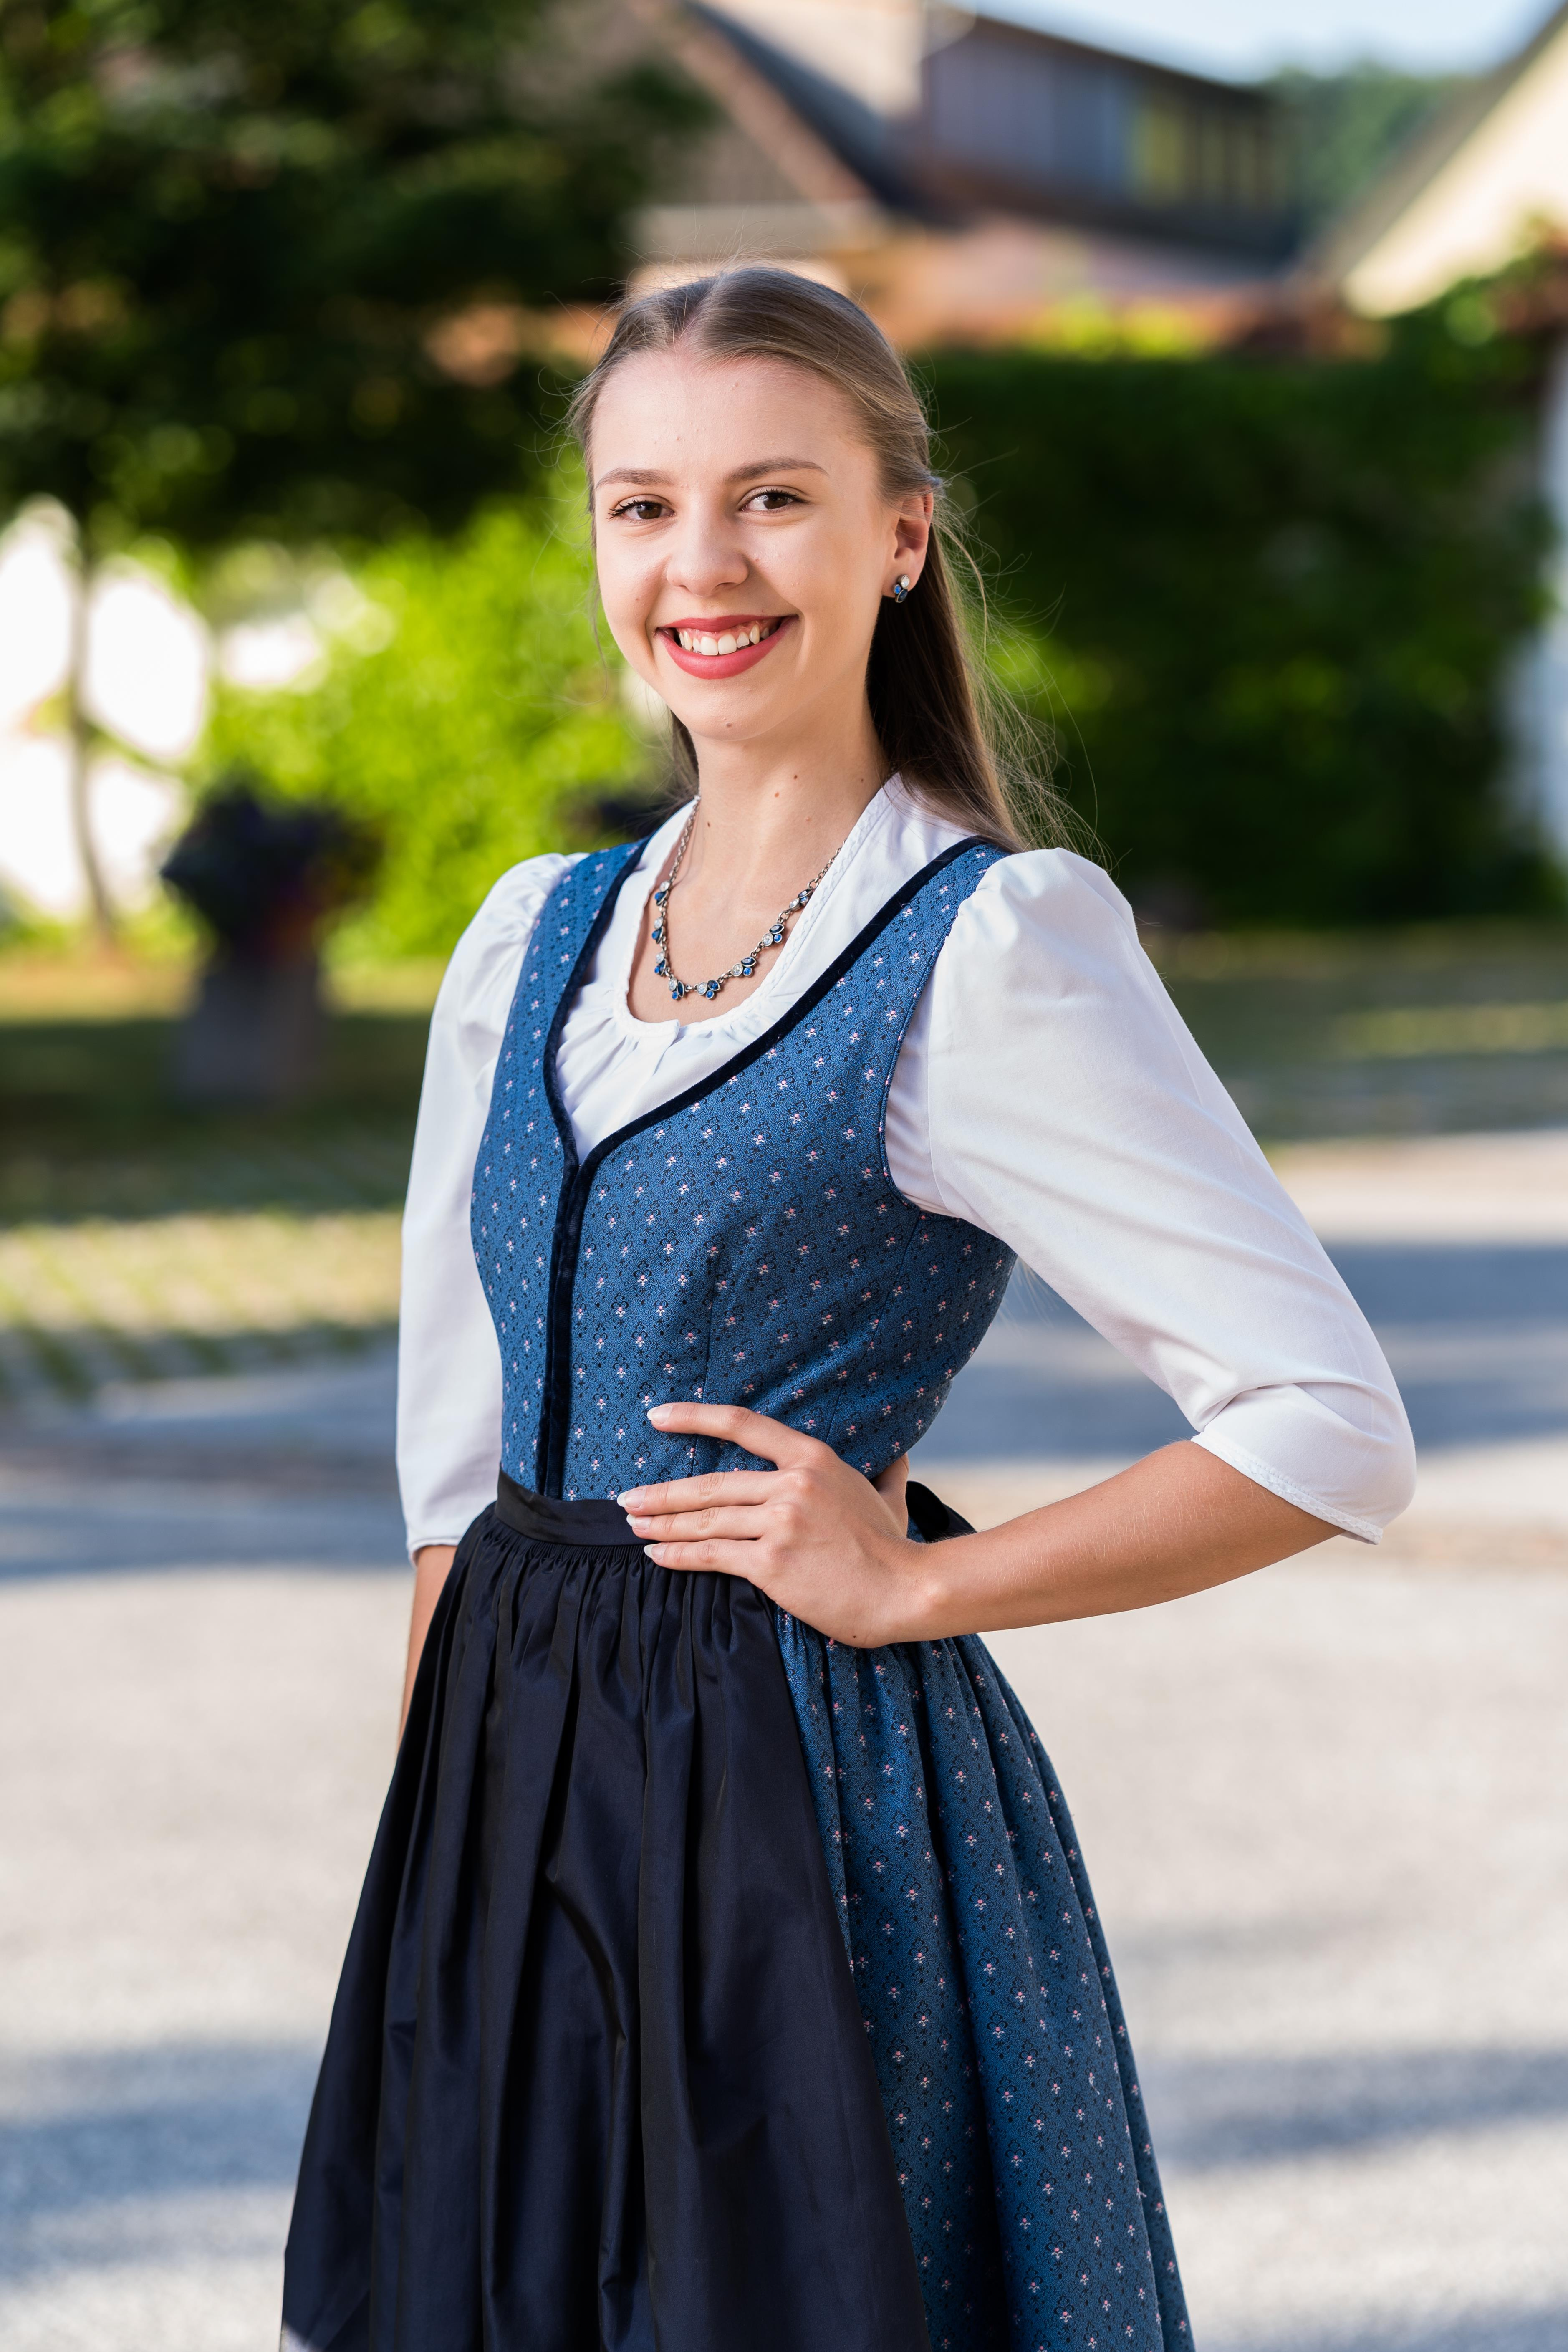 Julia Binder : Marketenderin